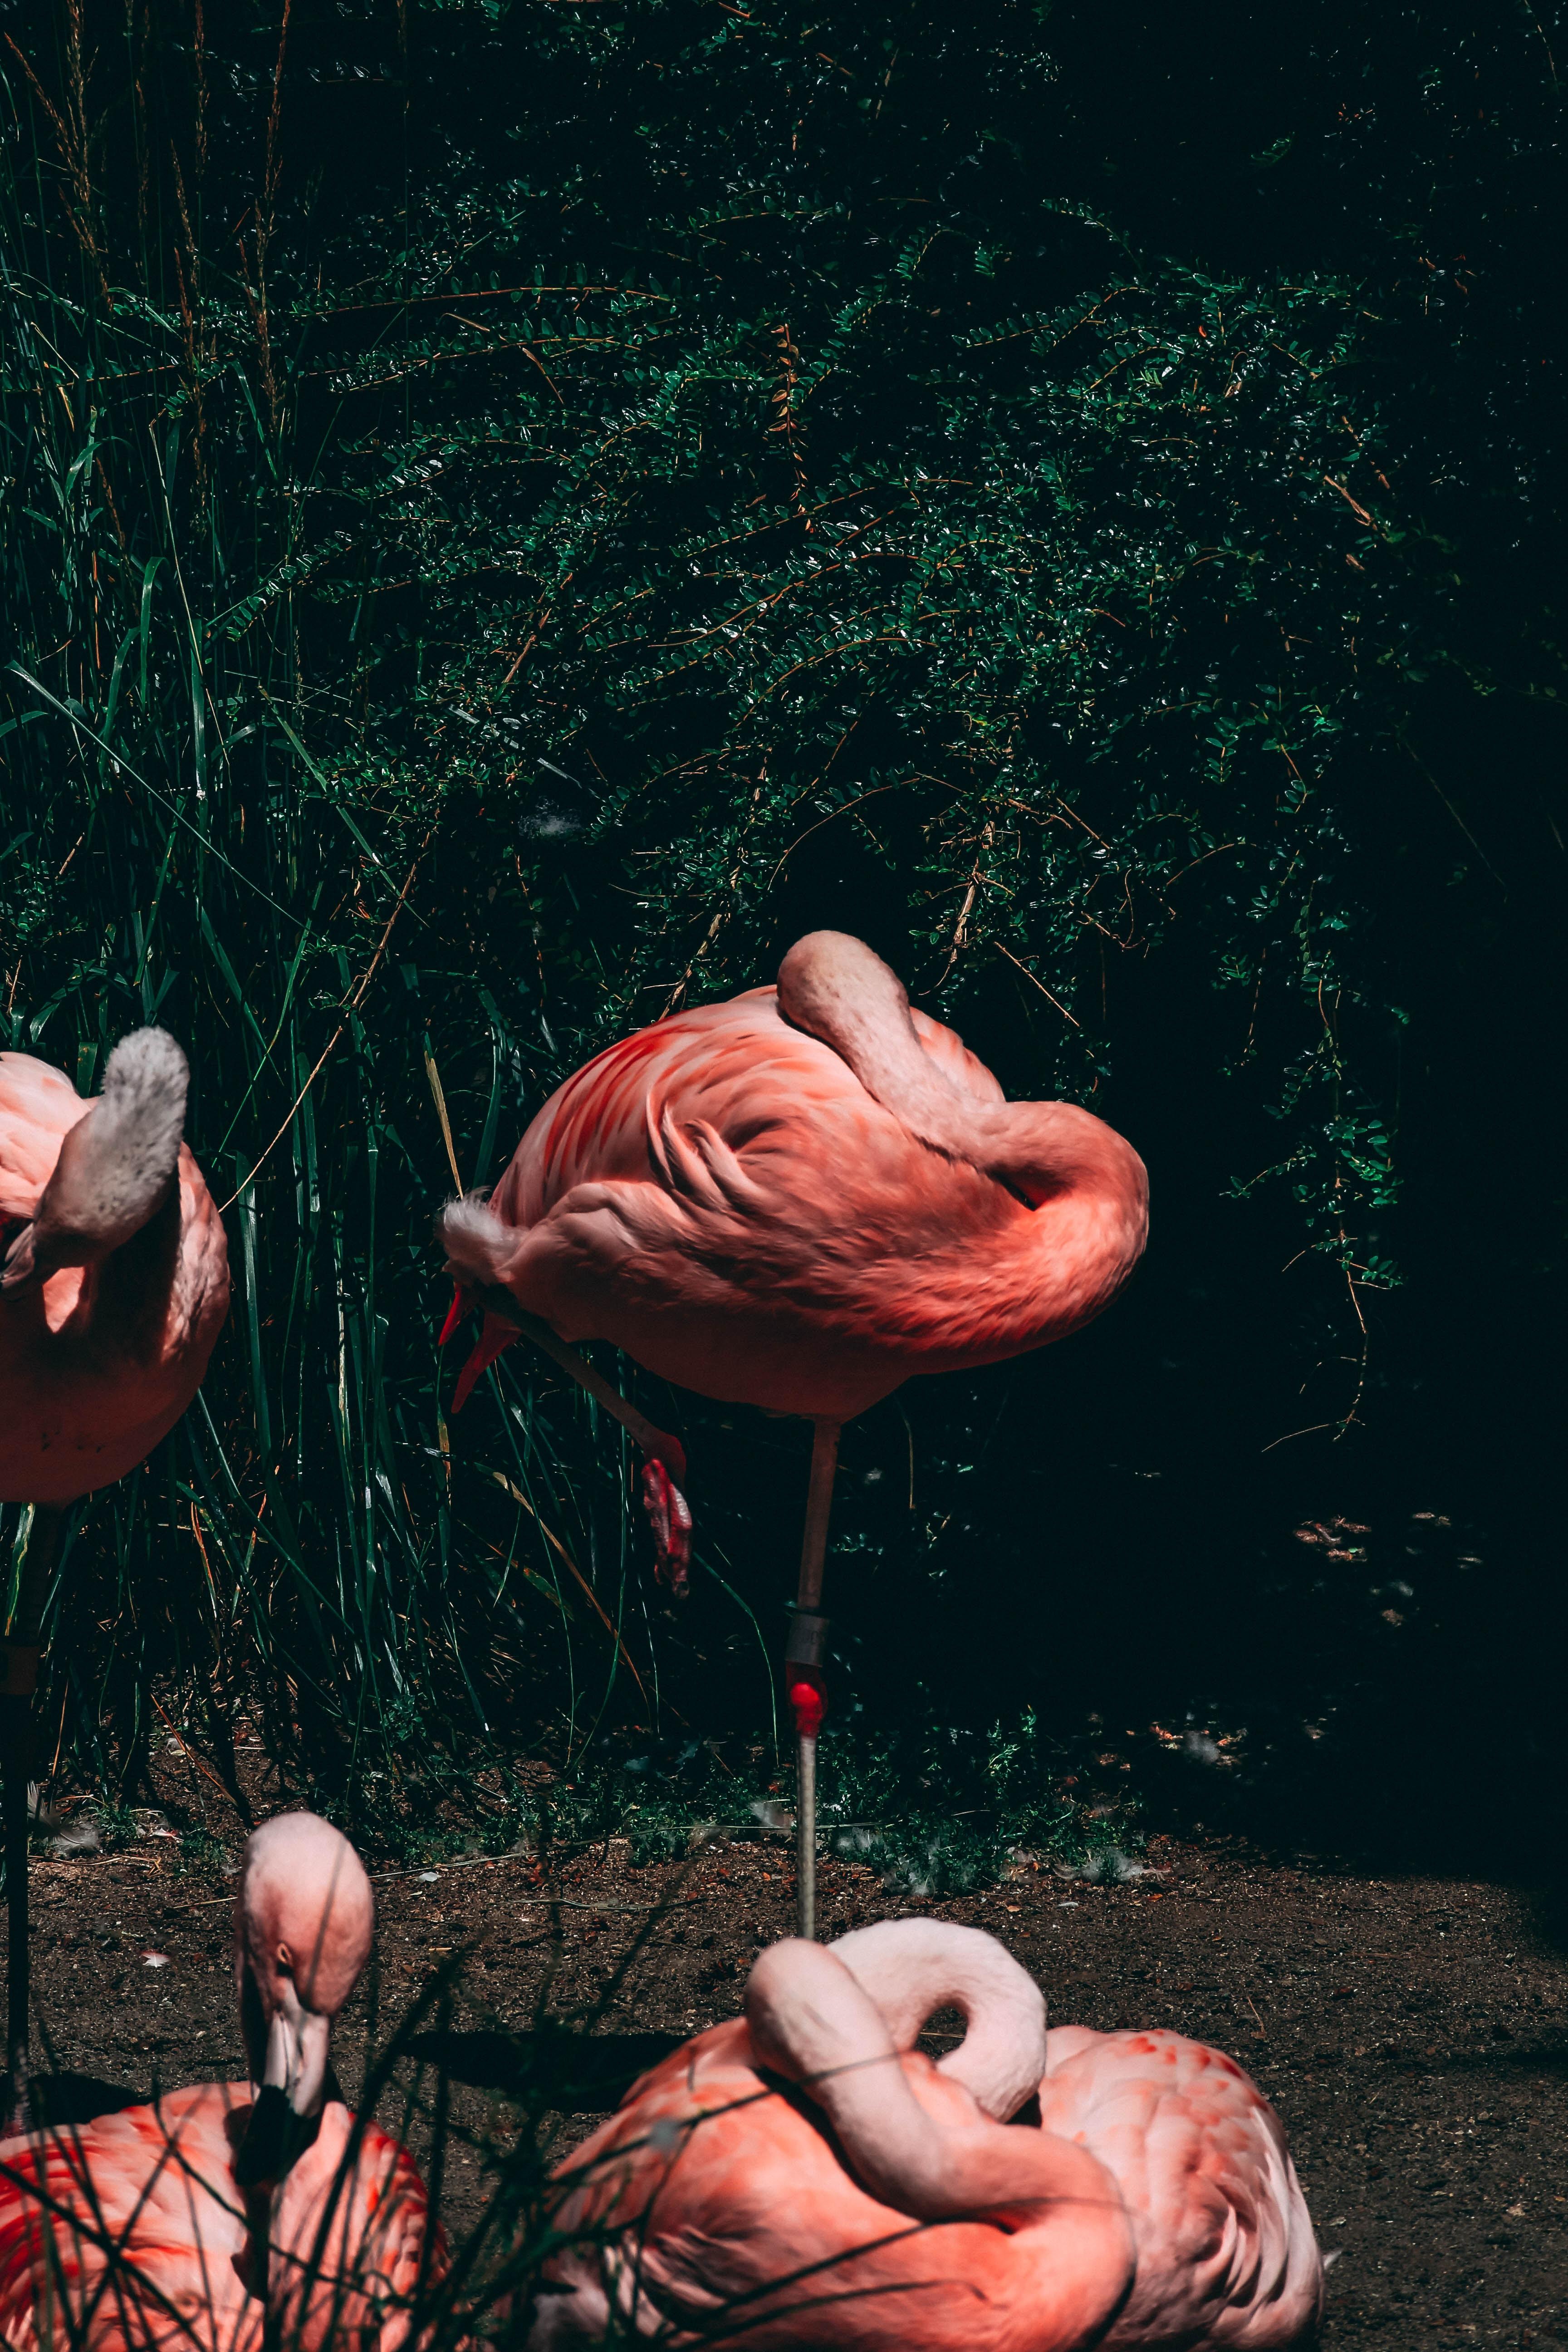 four flamingos near plants